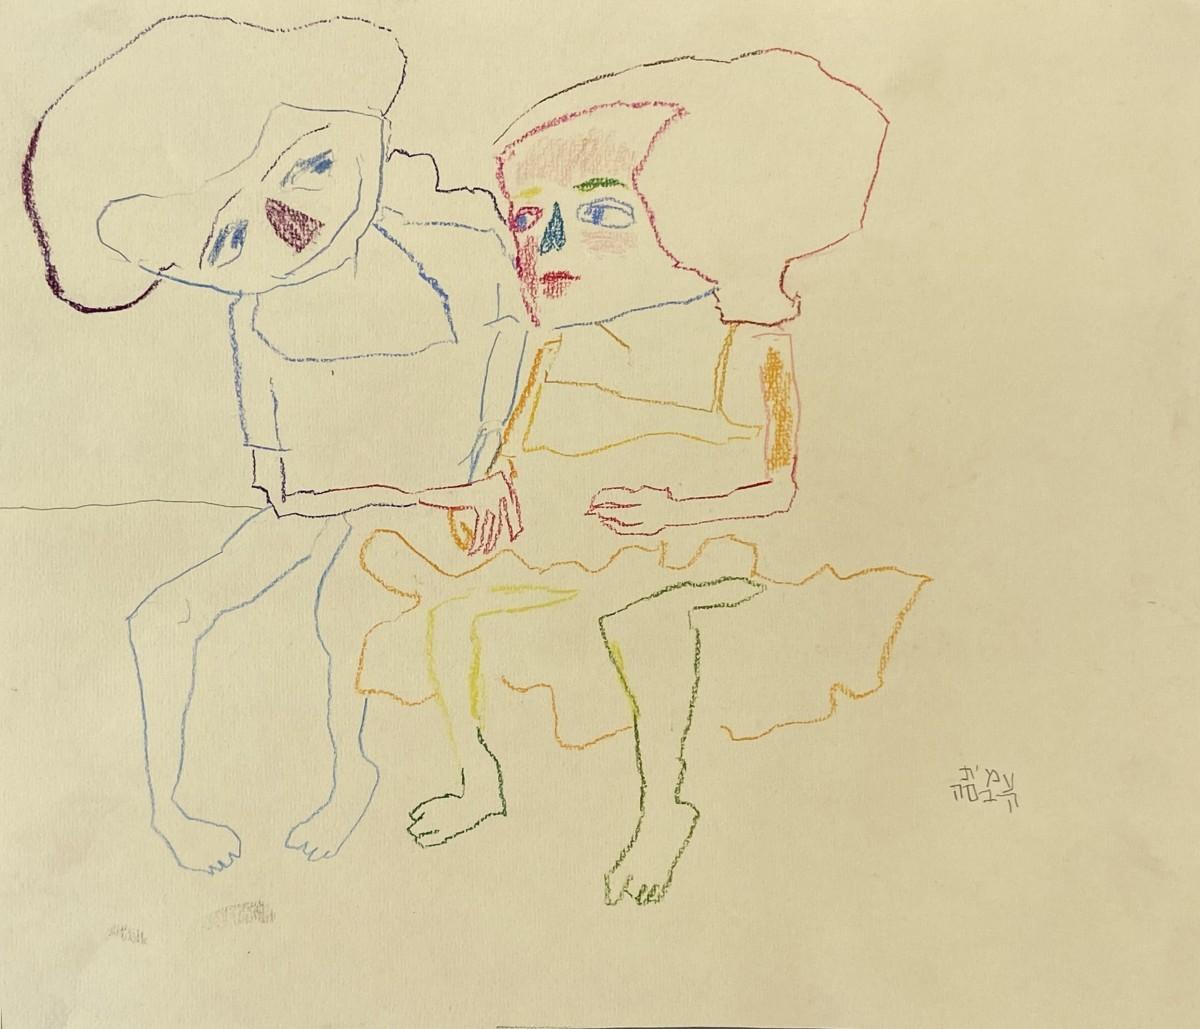 Amit Cabessa, 2020, Colored pencils on paper, 32.5x38